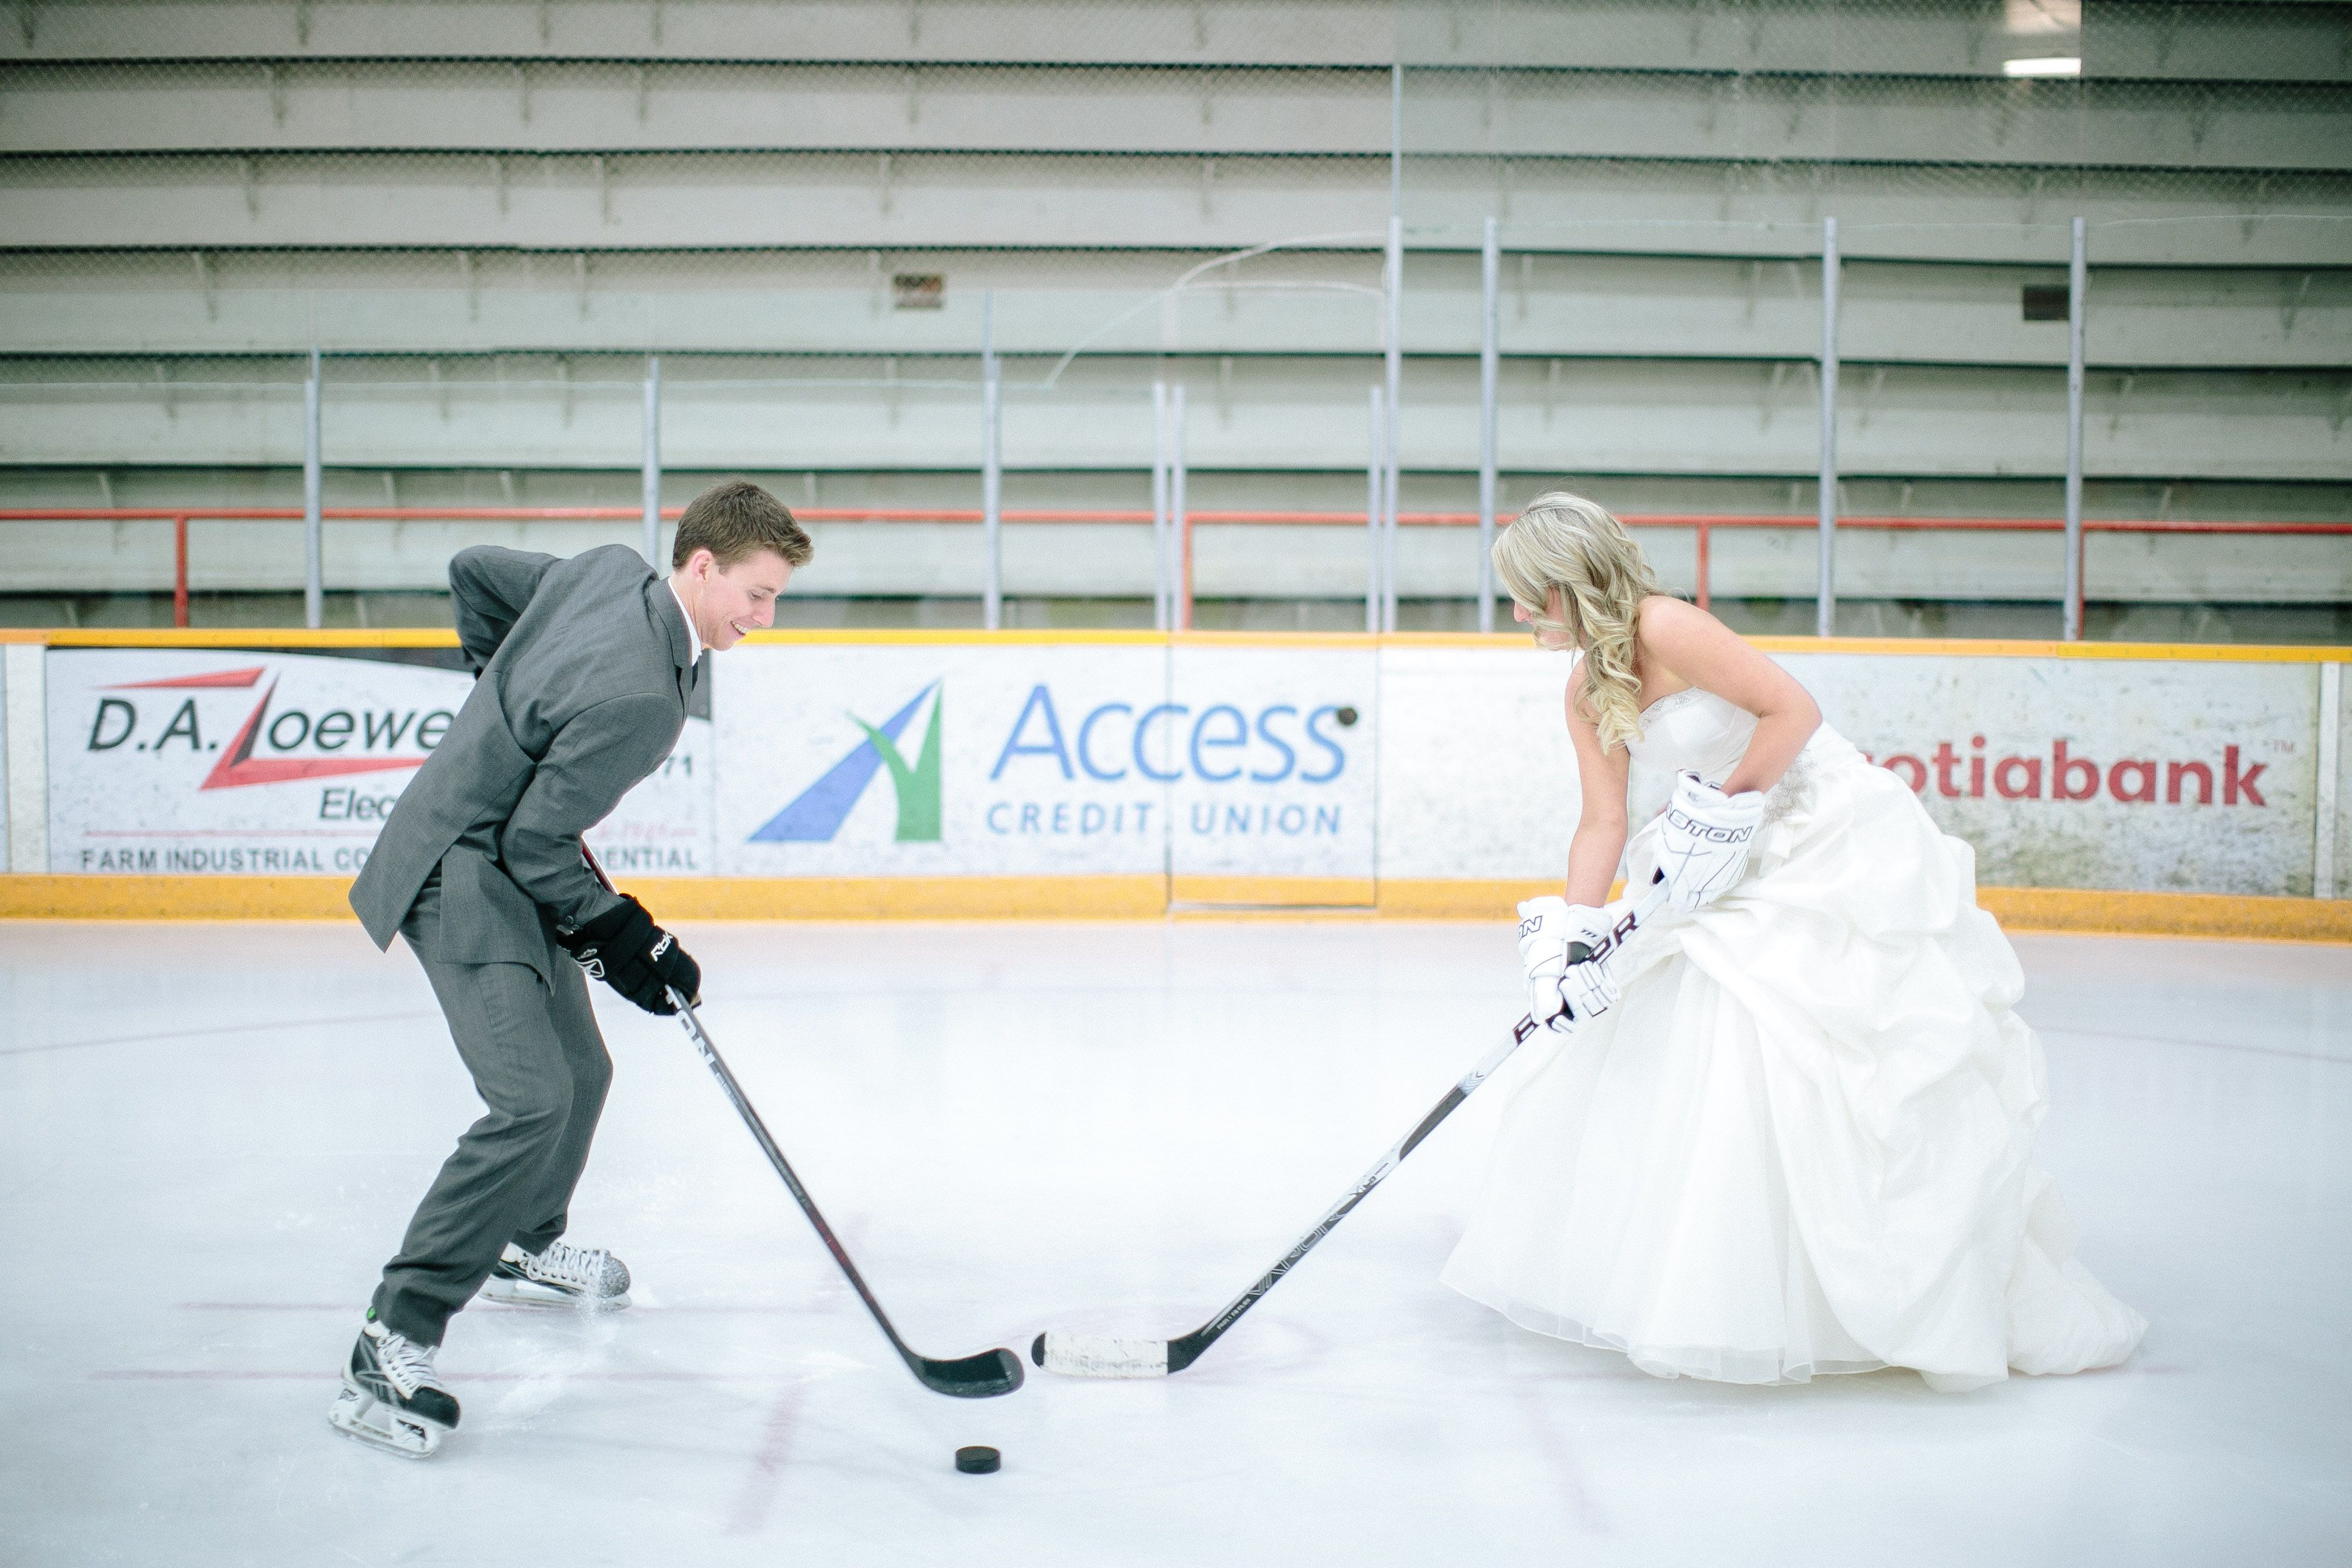 hockey wedding photography | ☆Everything HOCKEY☆ | Pinterest ...